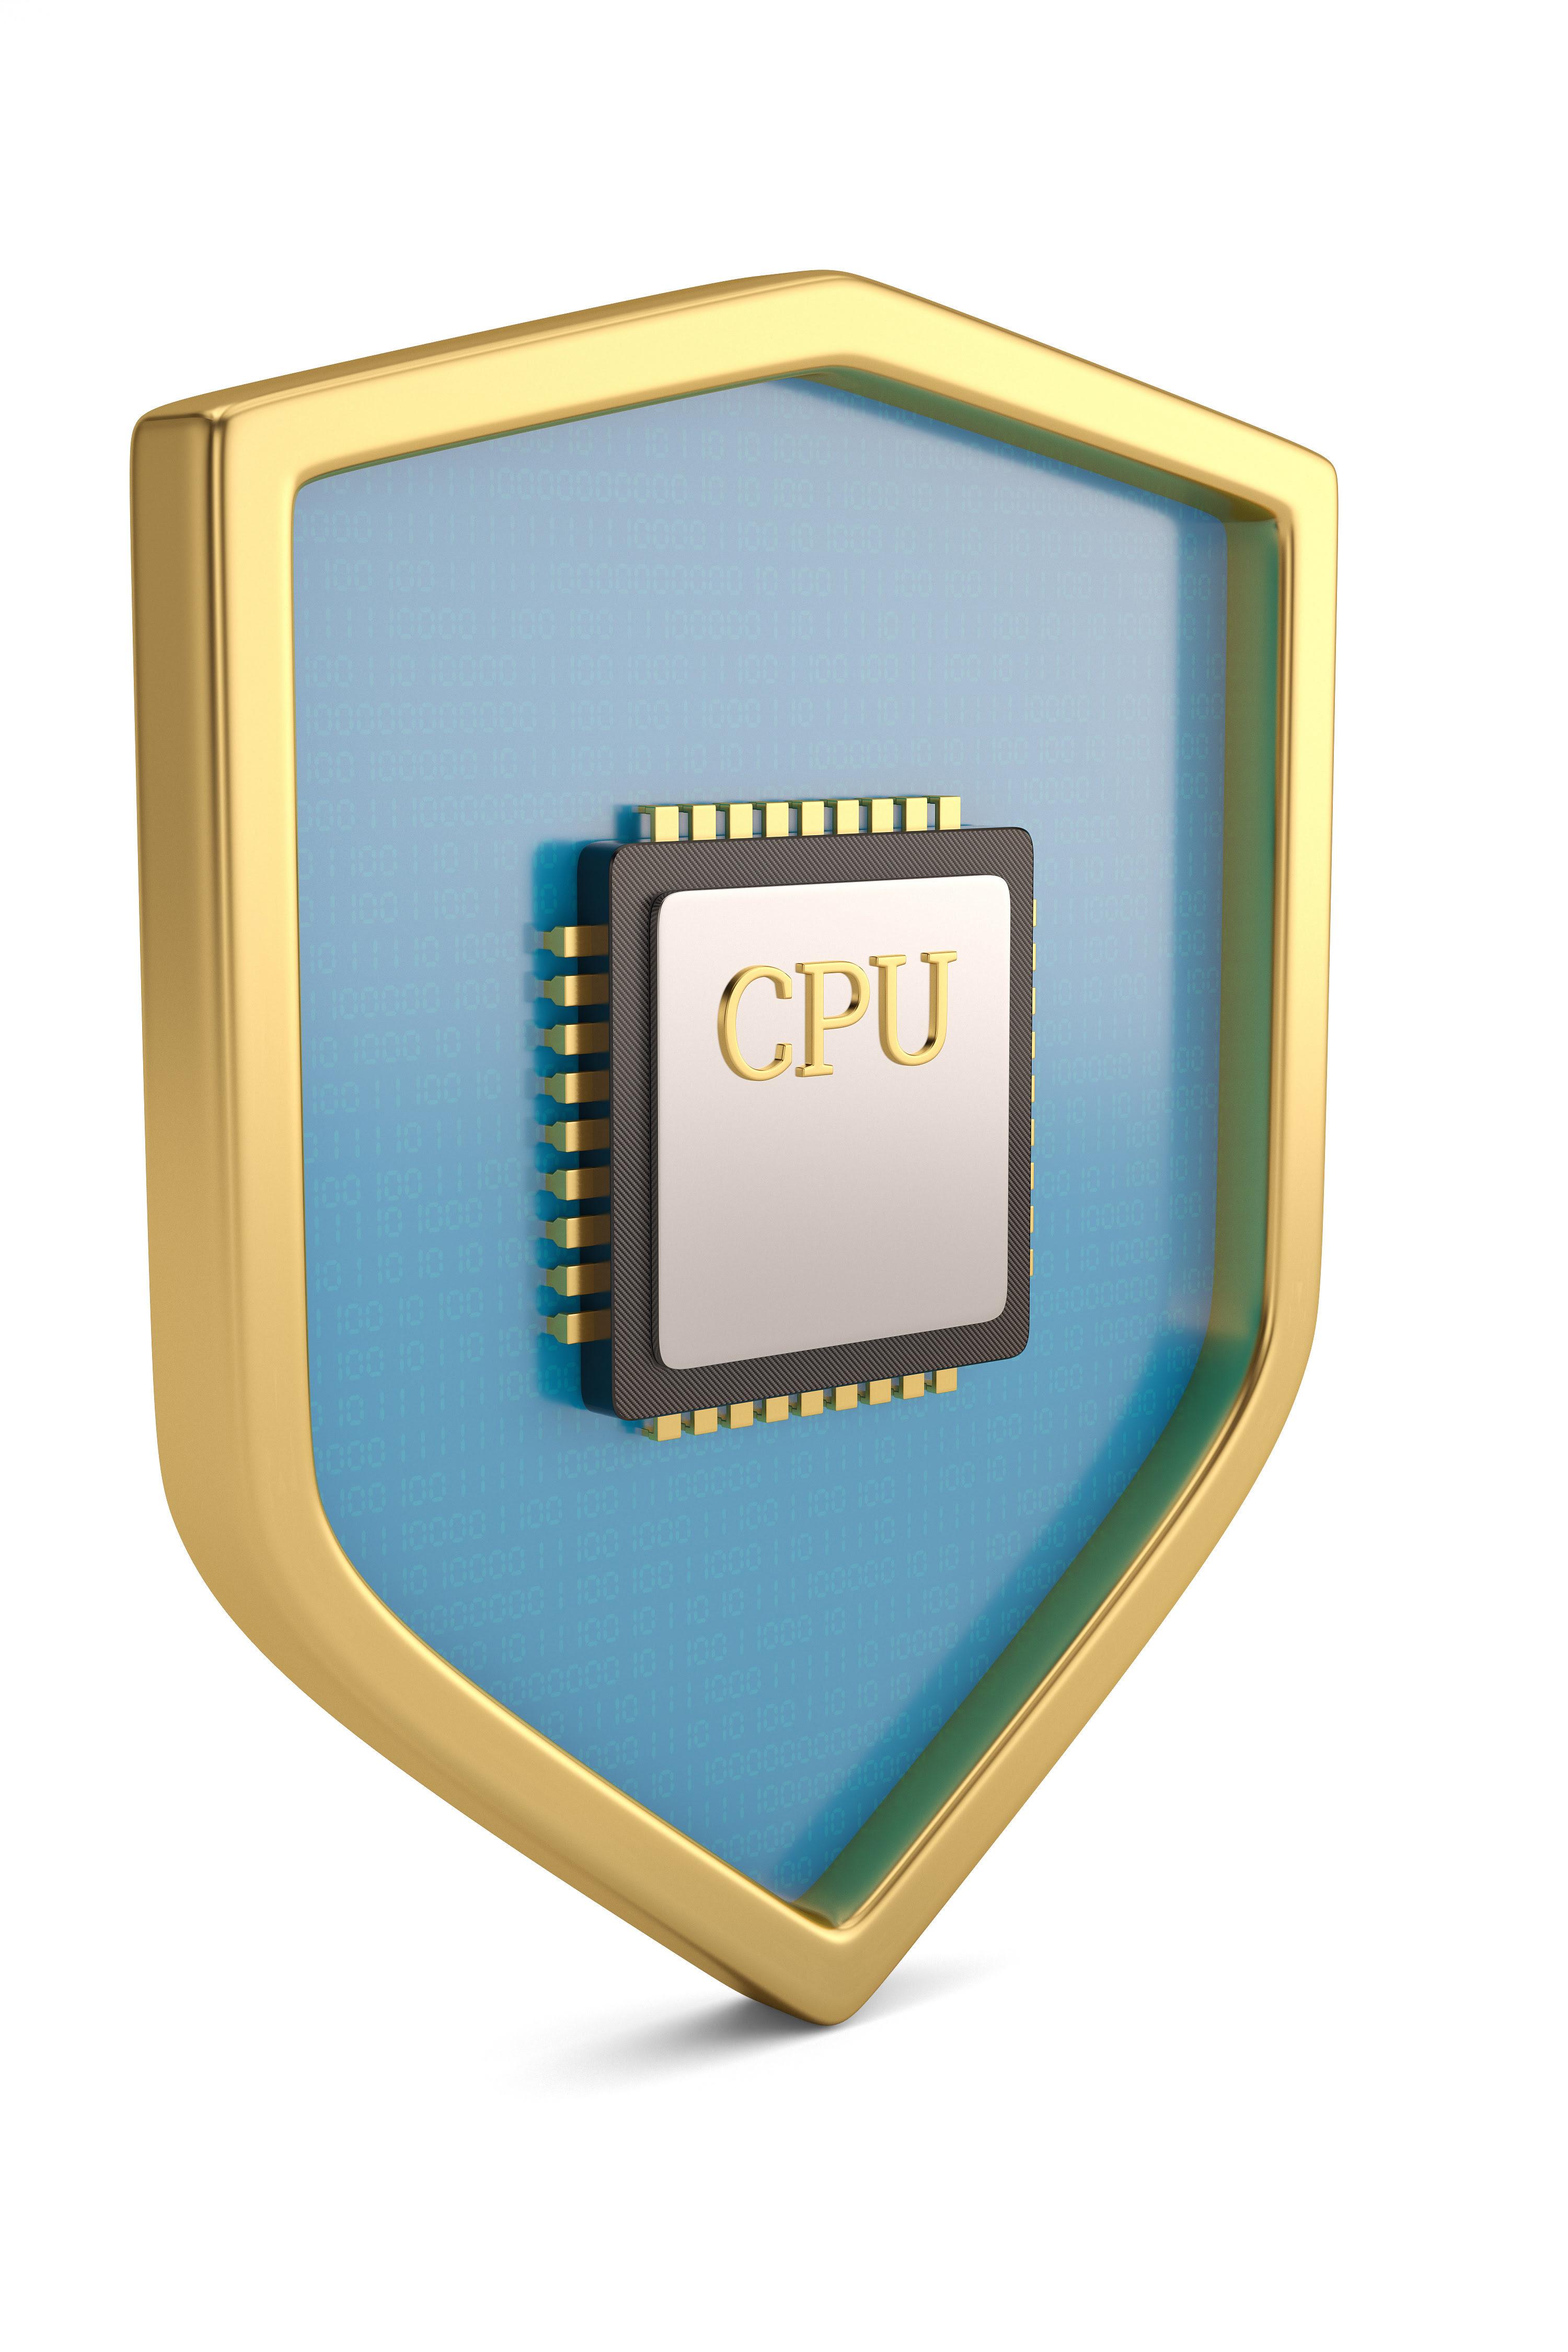 Chip in Shield